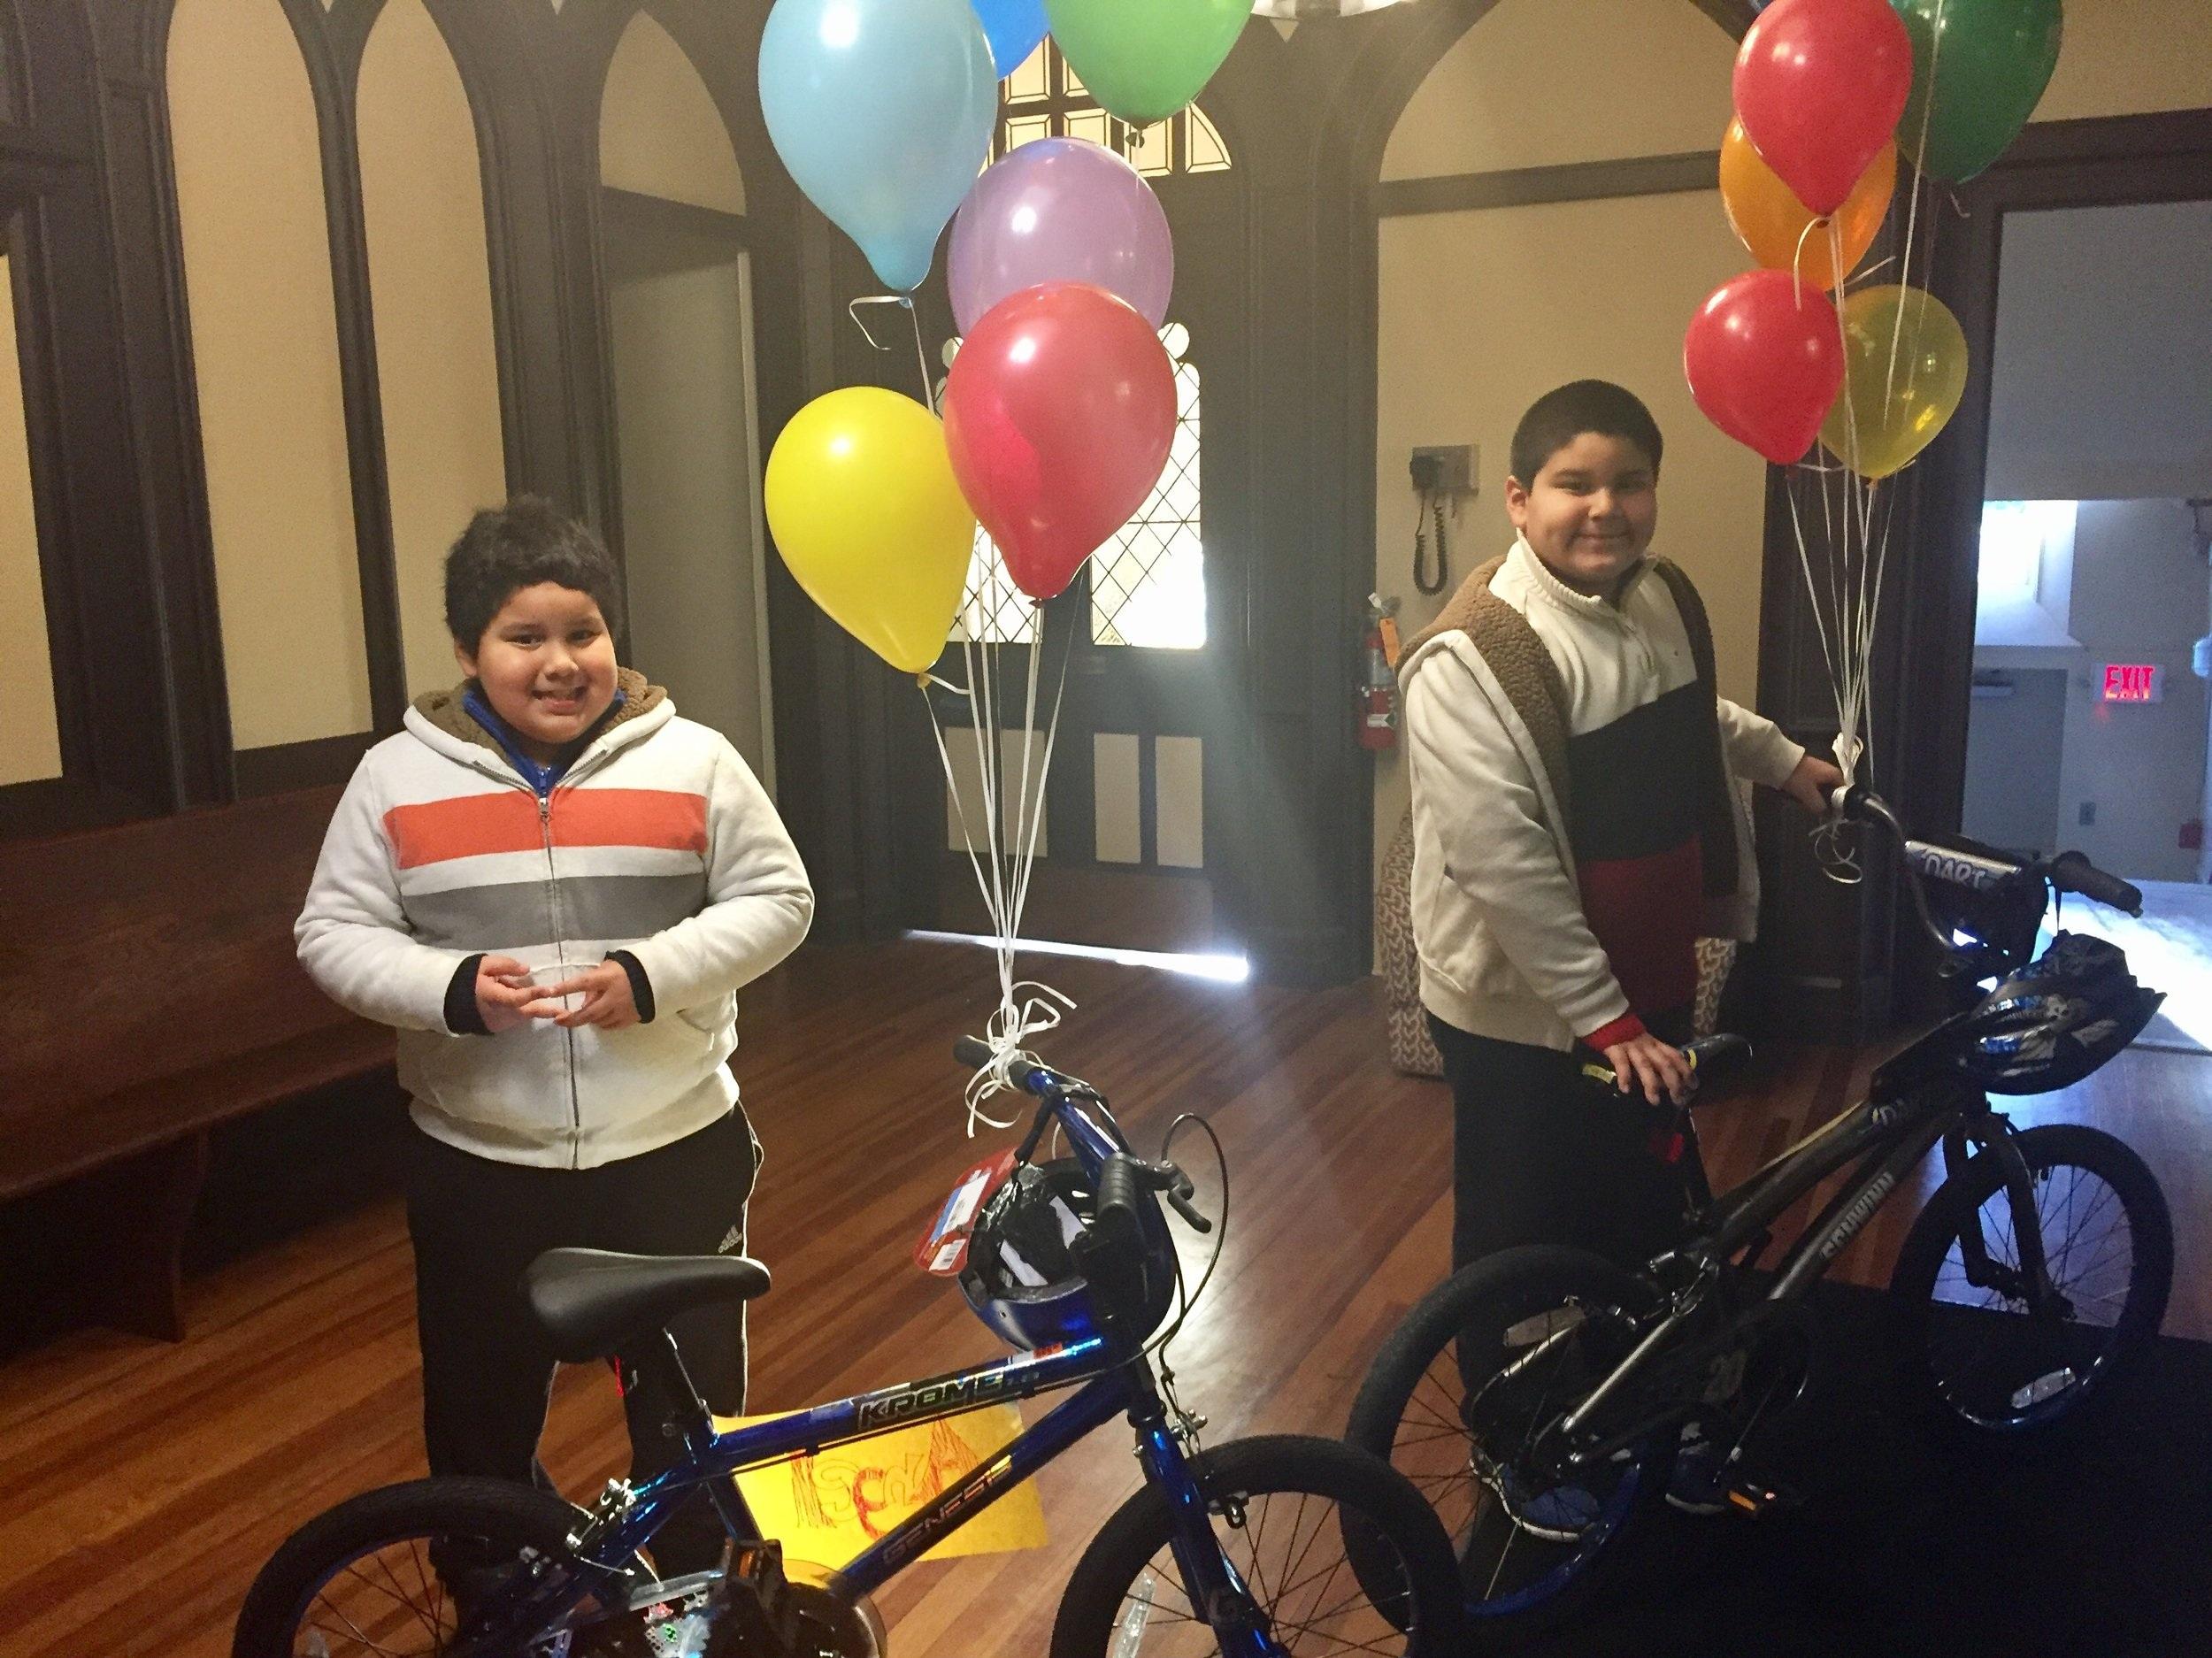 Children smiling on bikes